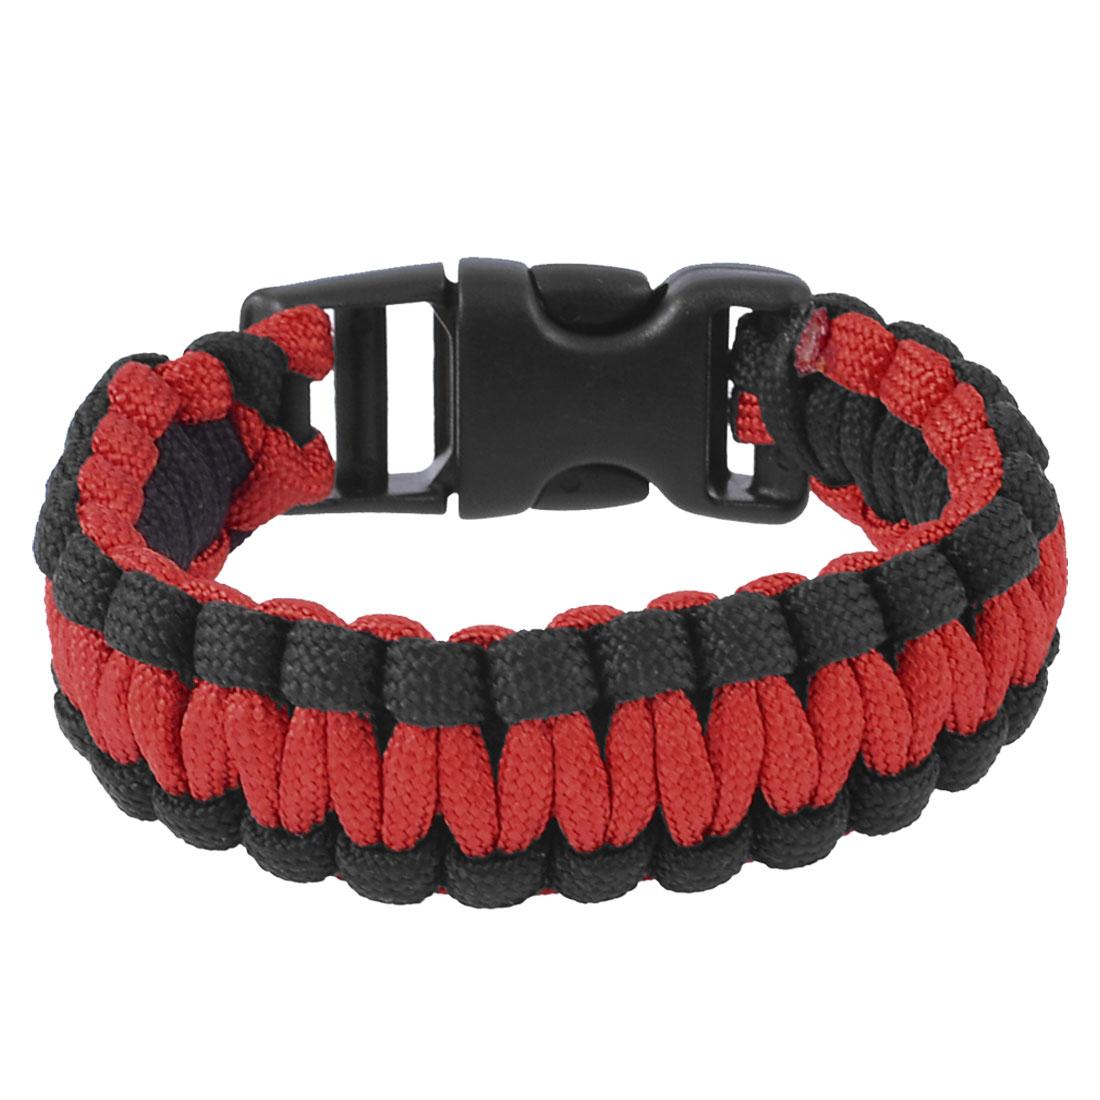 Whistle Buckle Black Red Cobra Weave Nylon Rescue Survival Bracelet